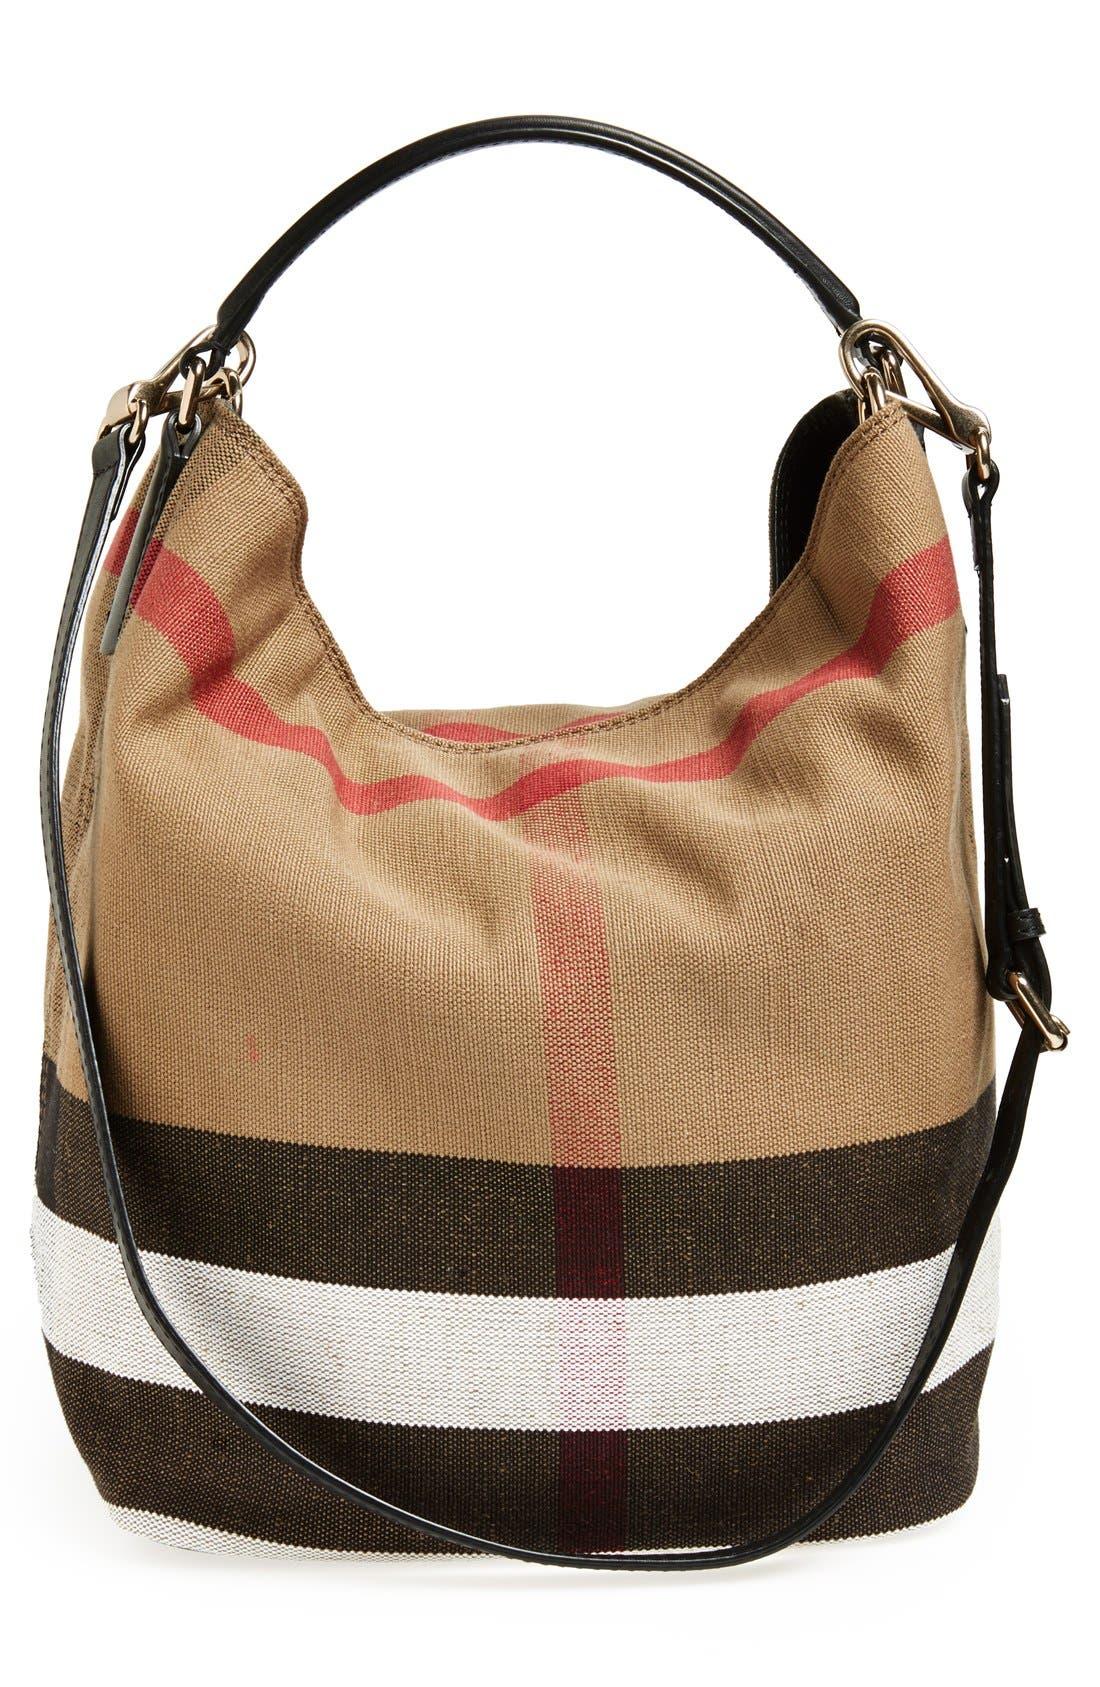 Medium Susanna Check Print Bucket Bag,                             Alternate thumbnail 4, color,                             001